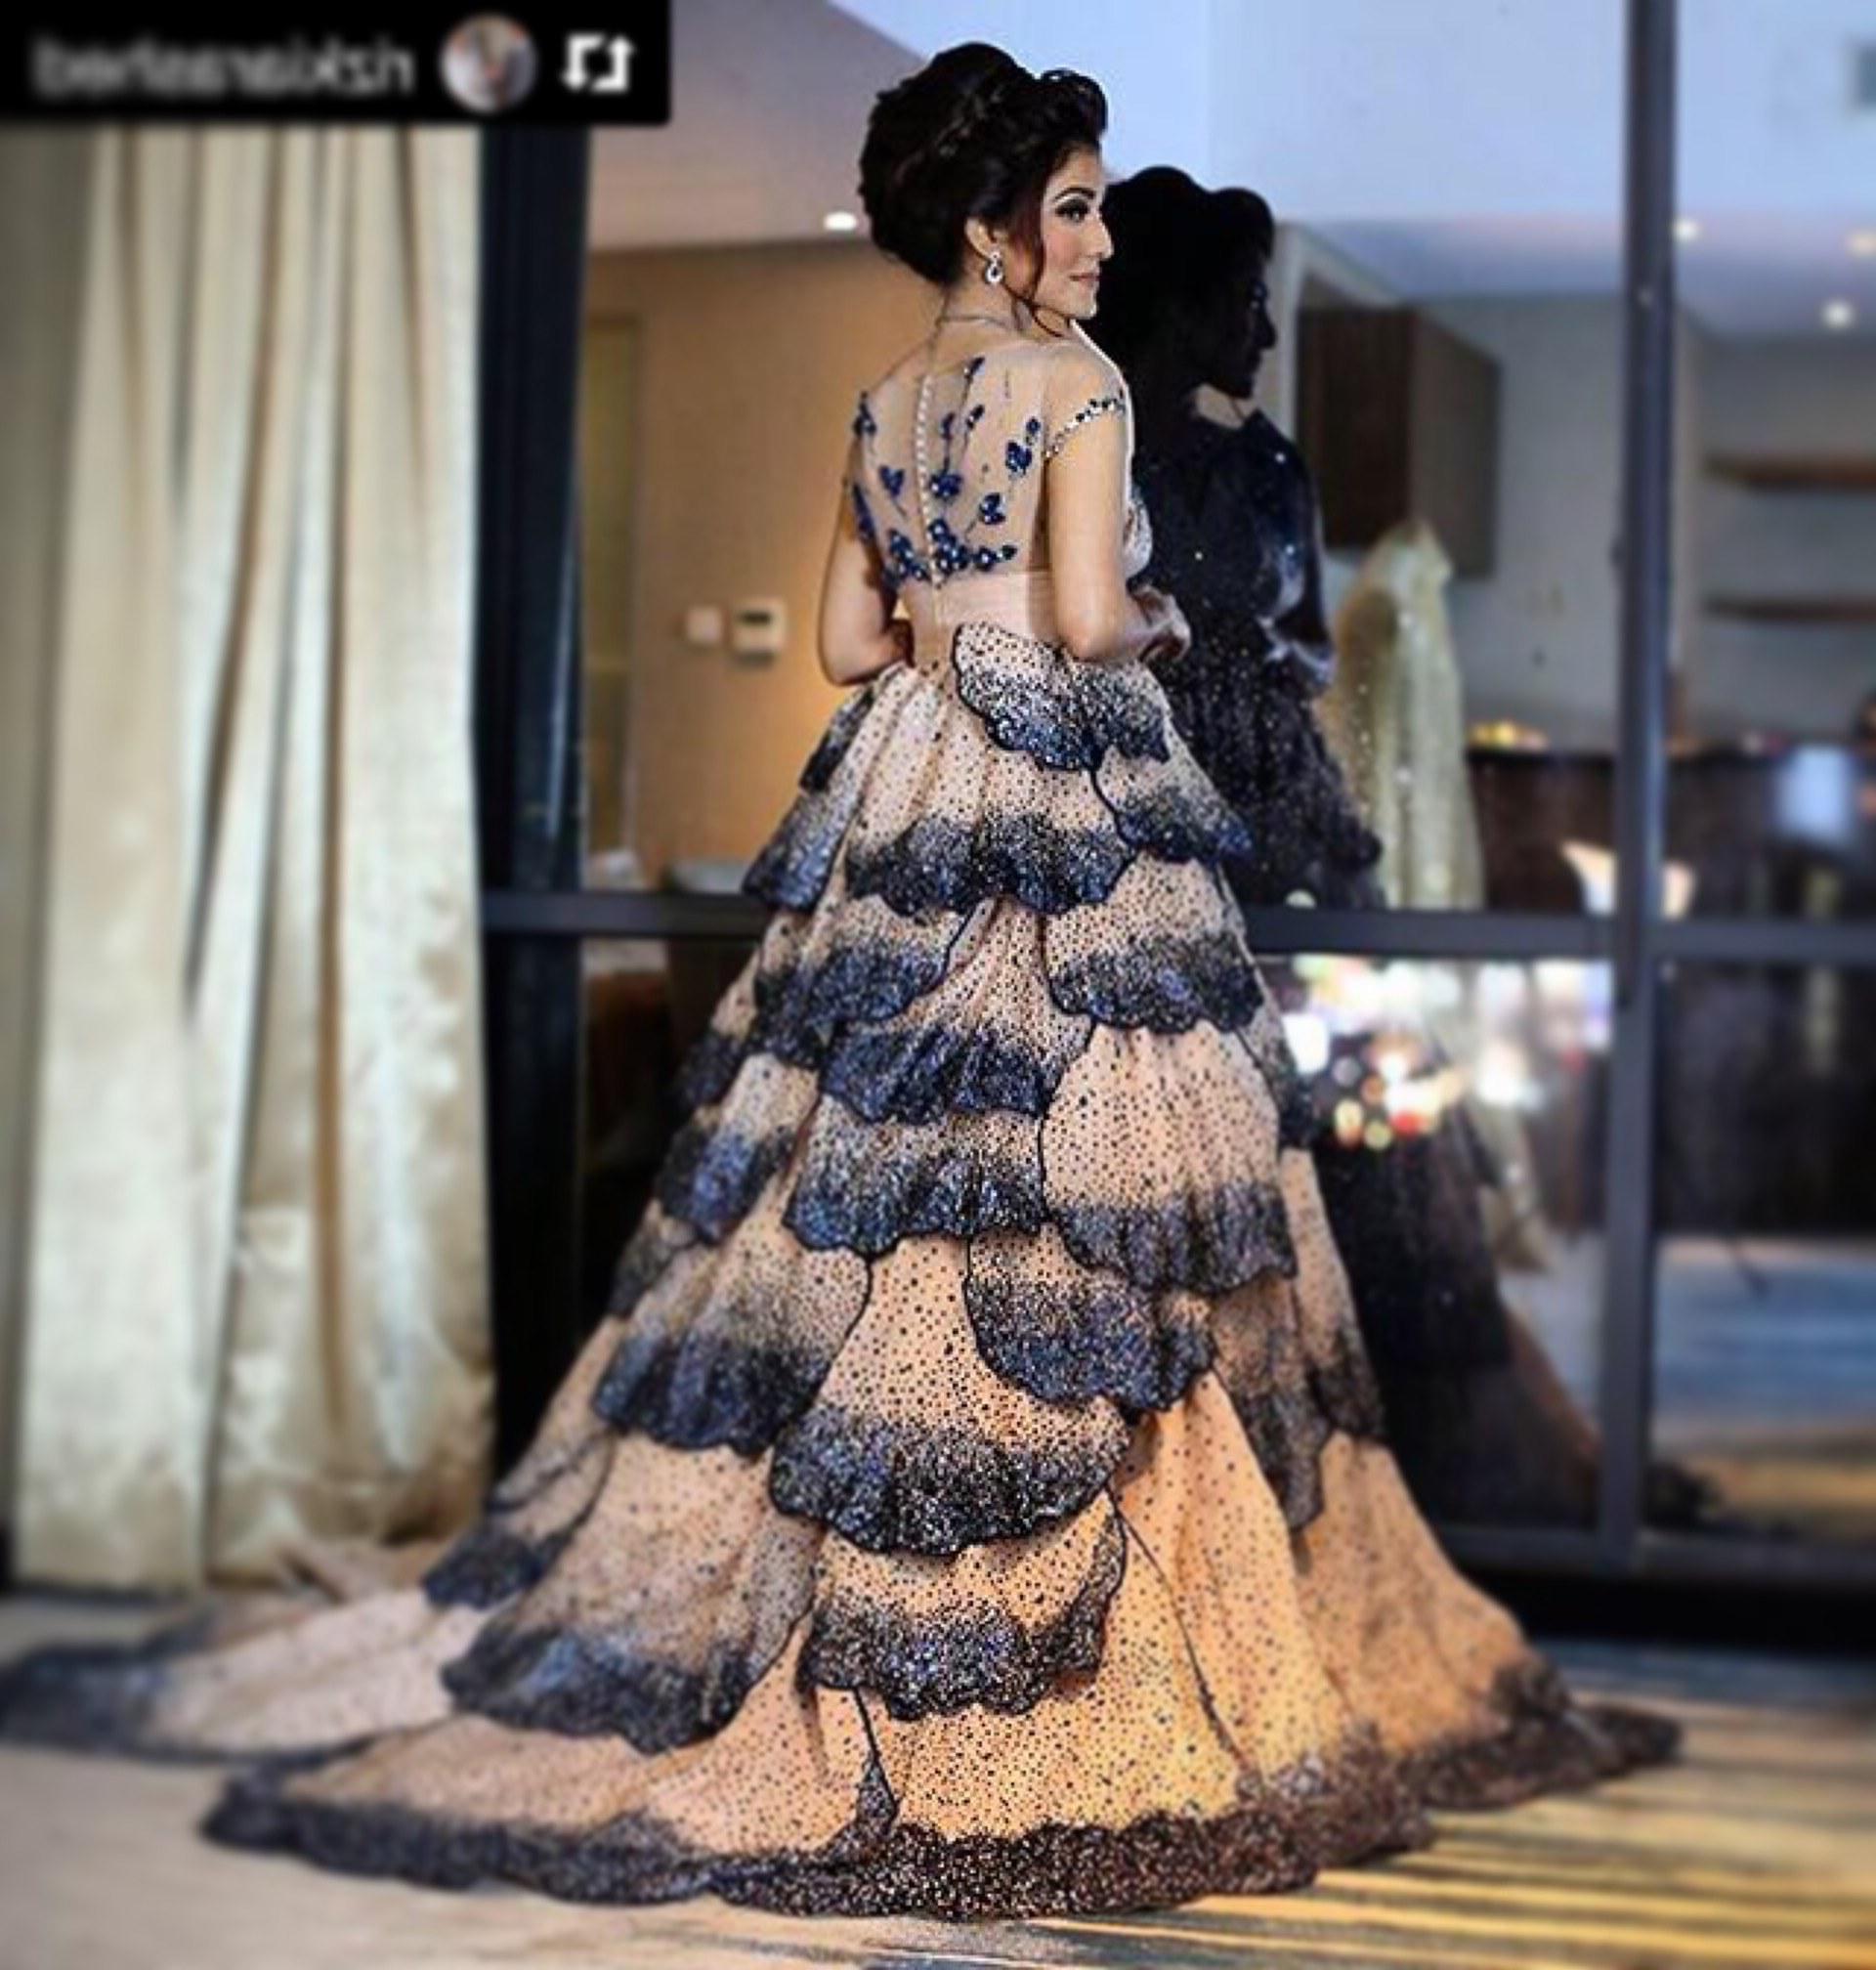 Design Baju Gaun Pengantin Muslim D0dg Eji atelier